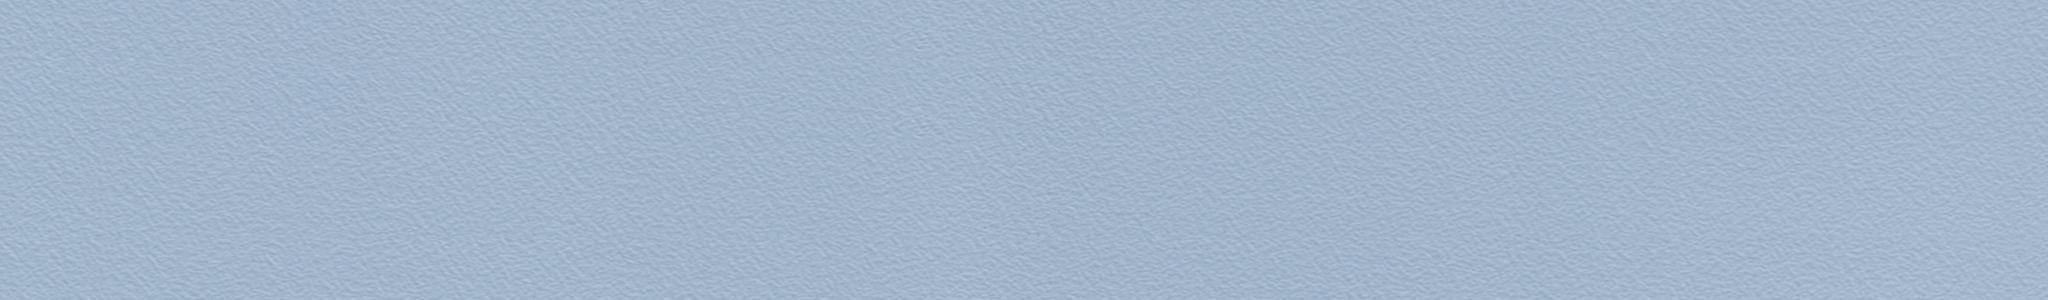 HU 158002 Bordo in ABS Blue Acqua Cera XG